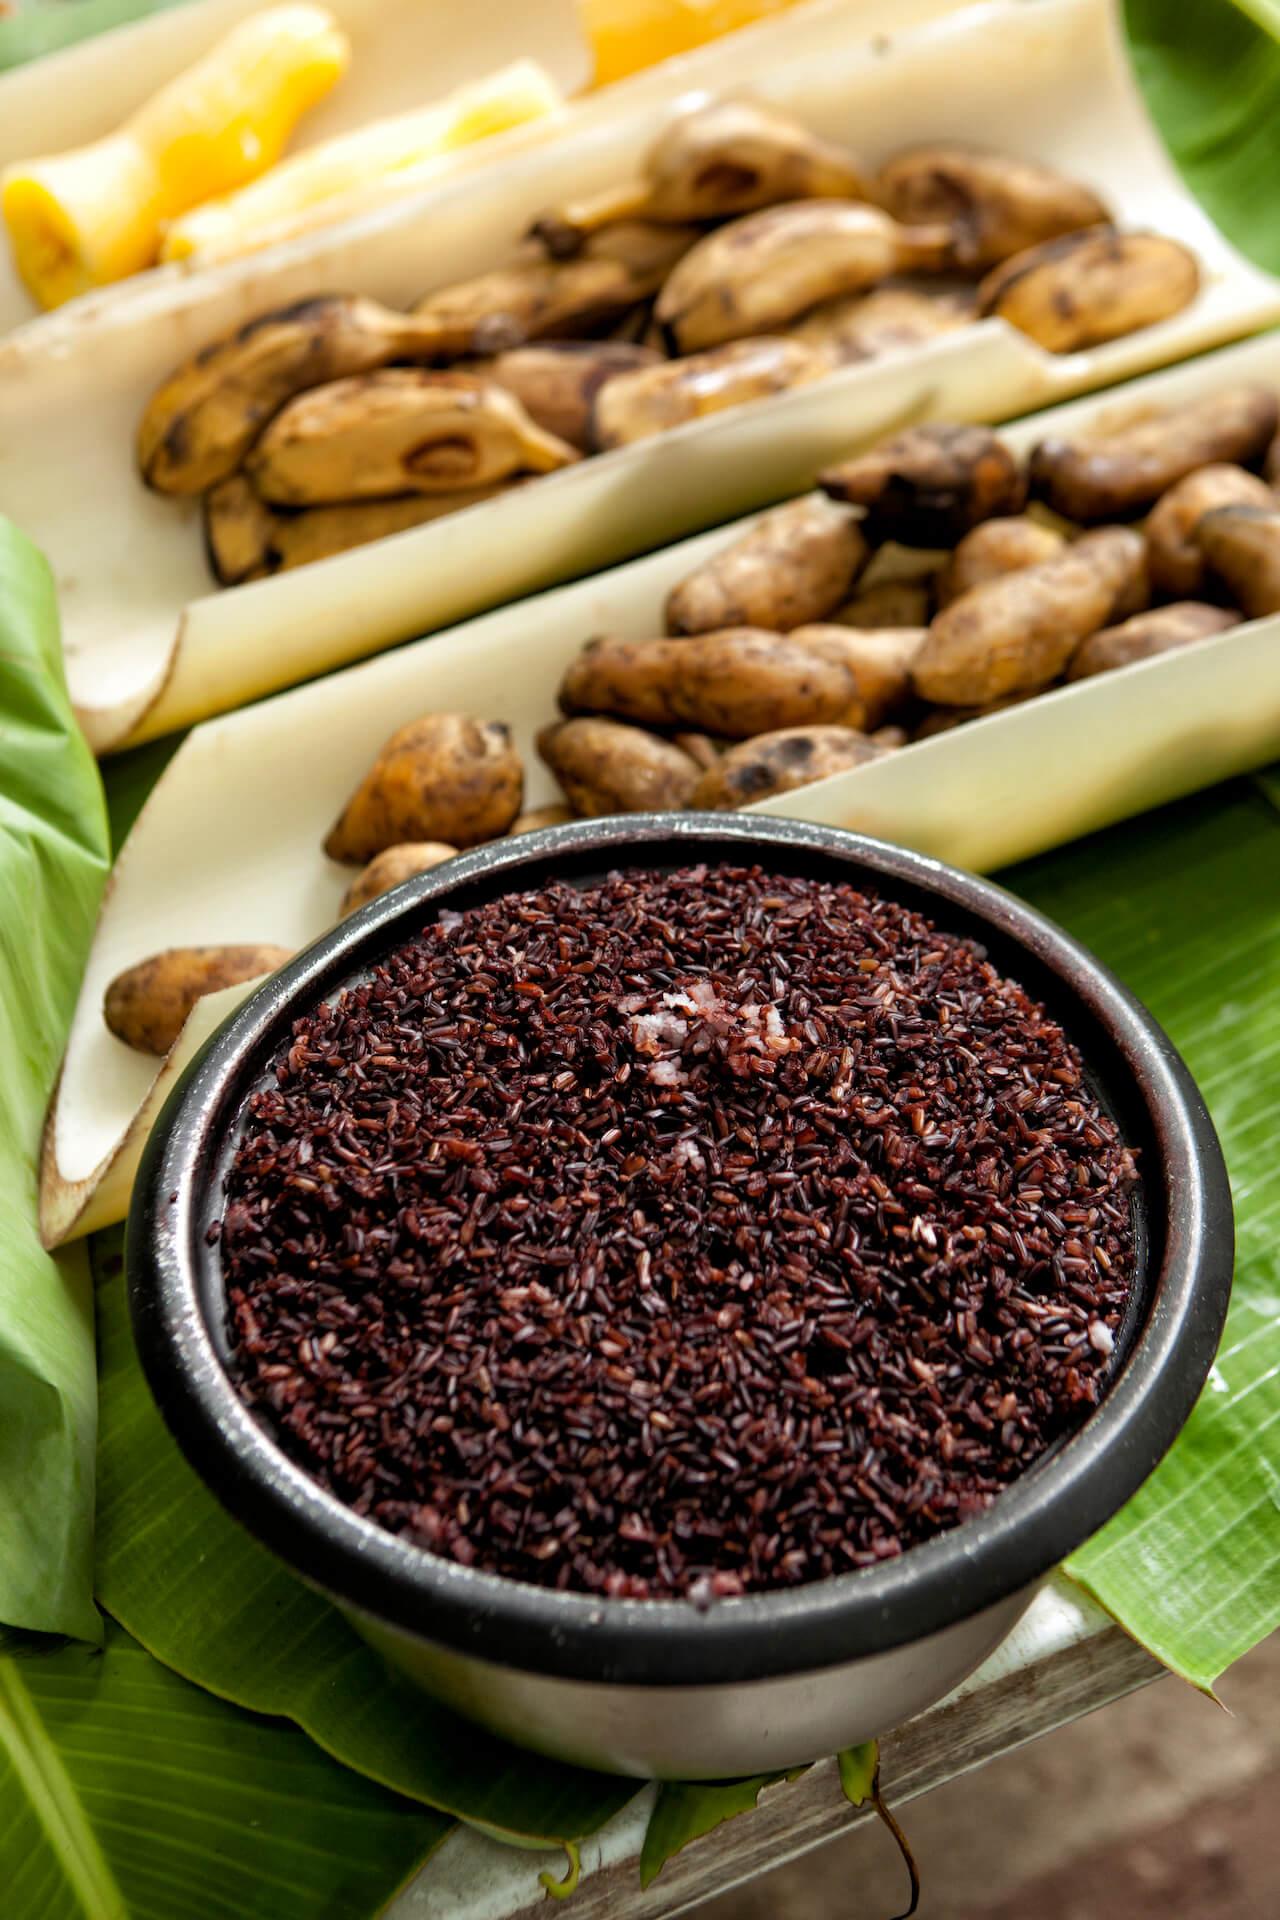 Black rice from Boyet Uychiat's farm